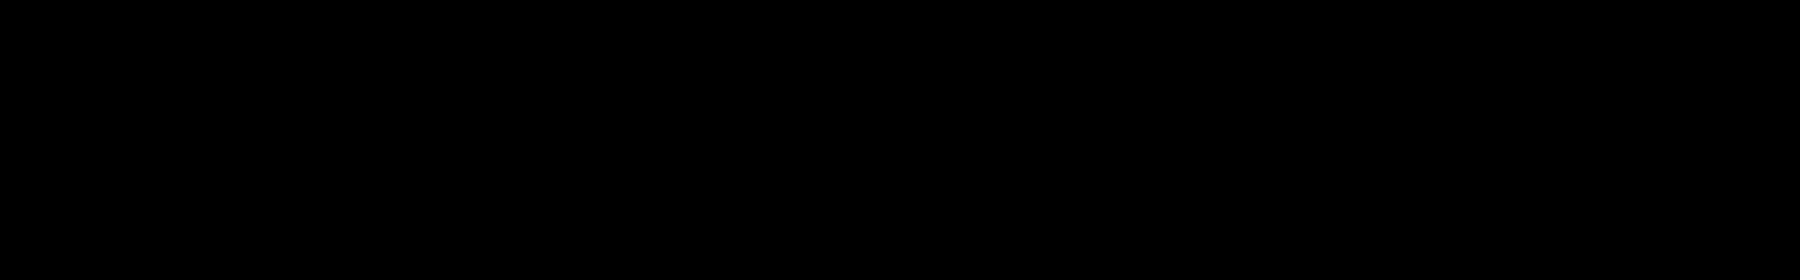 MADEON Trance Soundset For Sylenth1 audio waveform